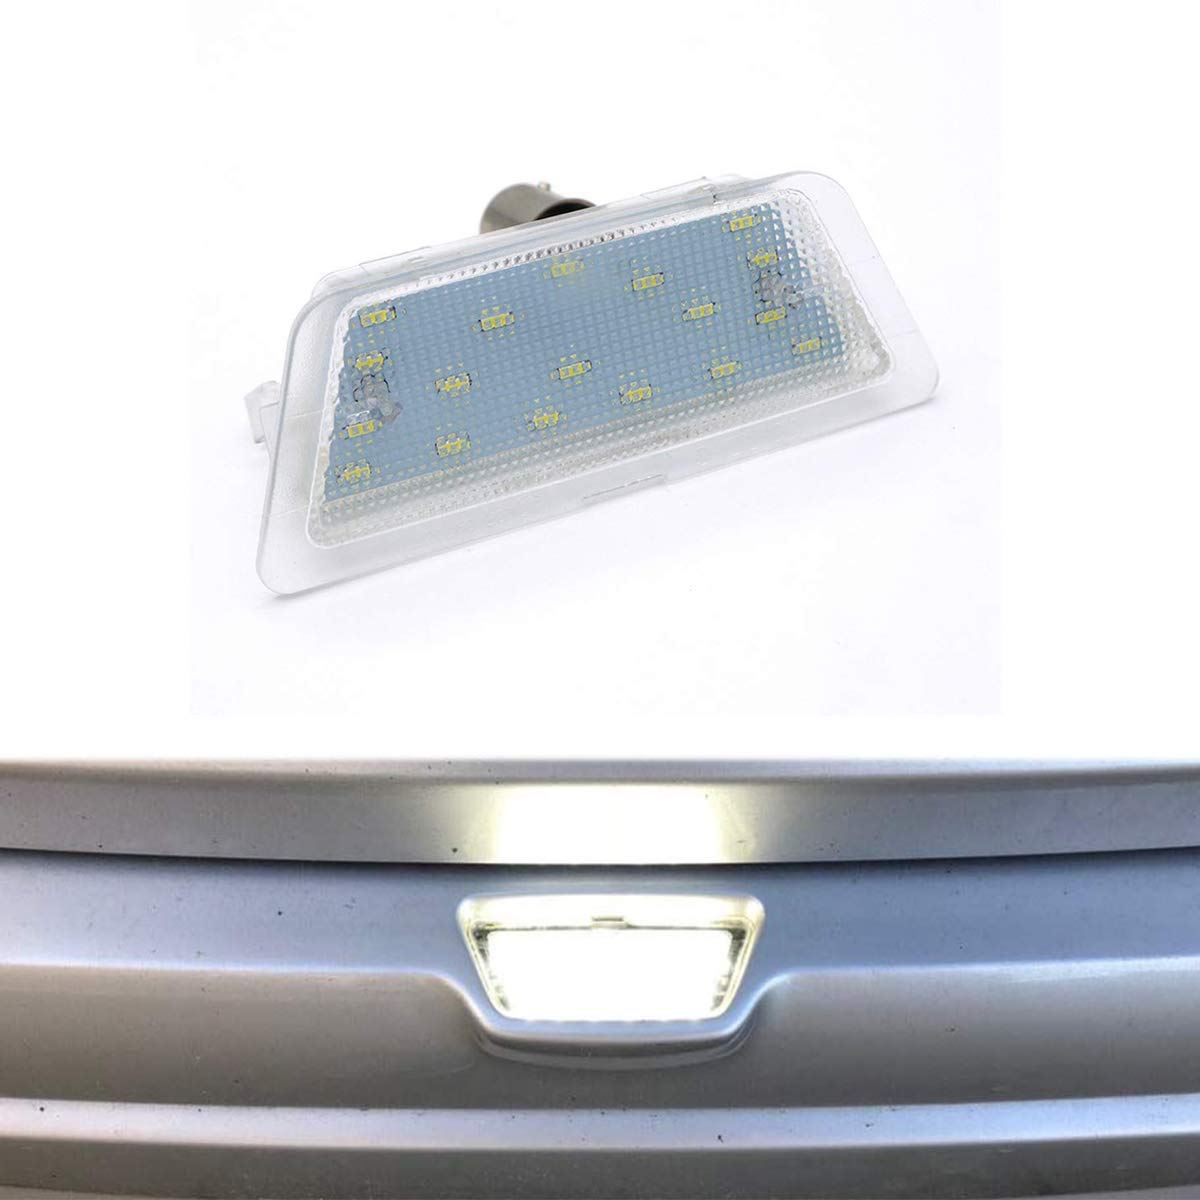 GOFORJUMP 1X LED For Astra G 98-04 led number license plate light car license light car styling car led light for O//pel Astra G 98-04